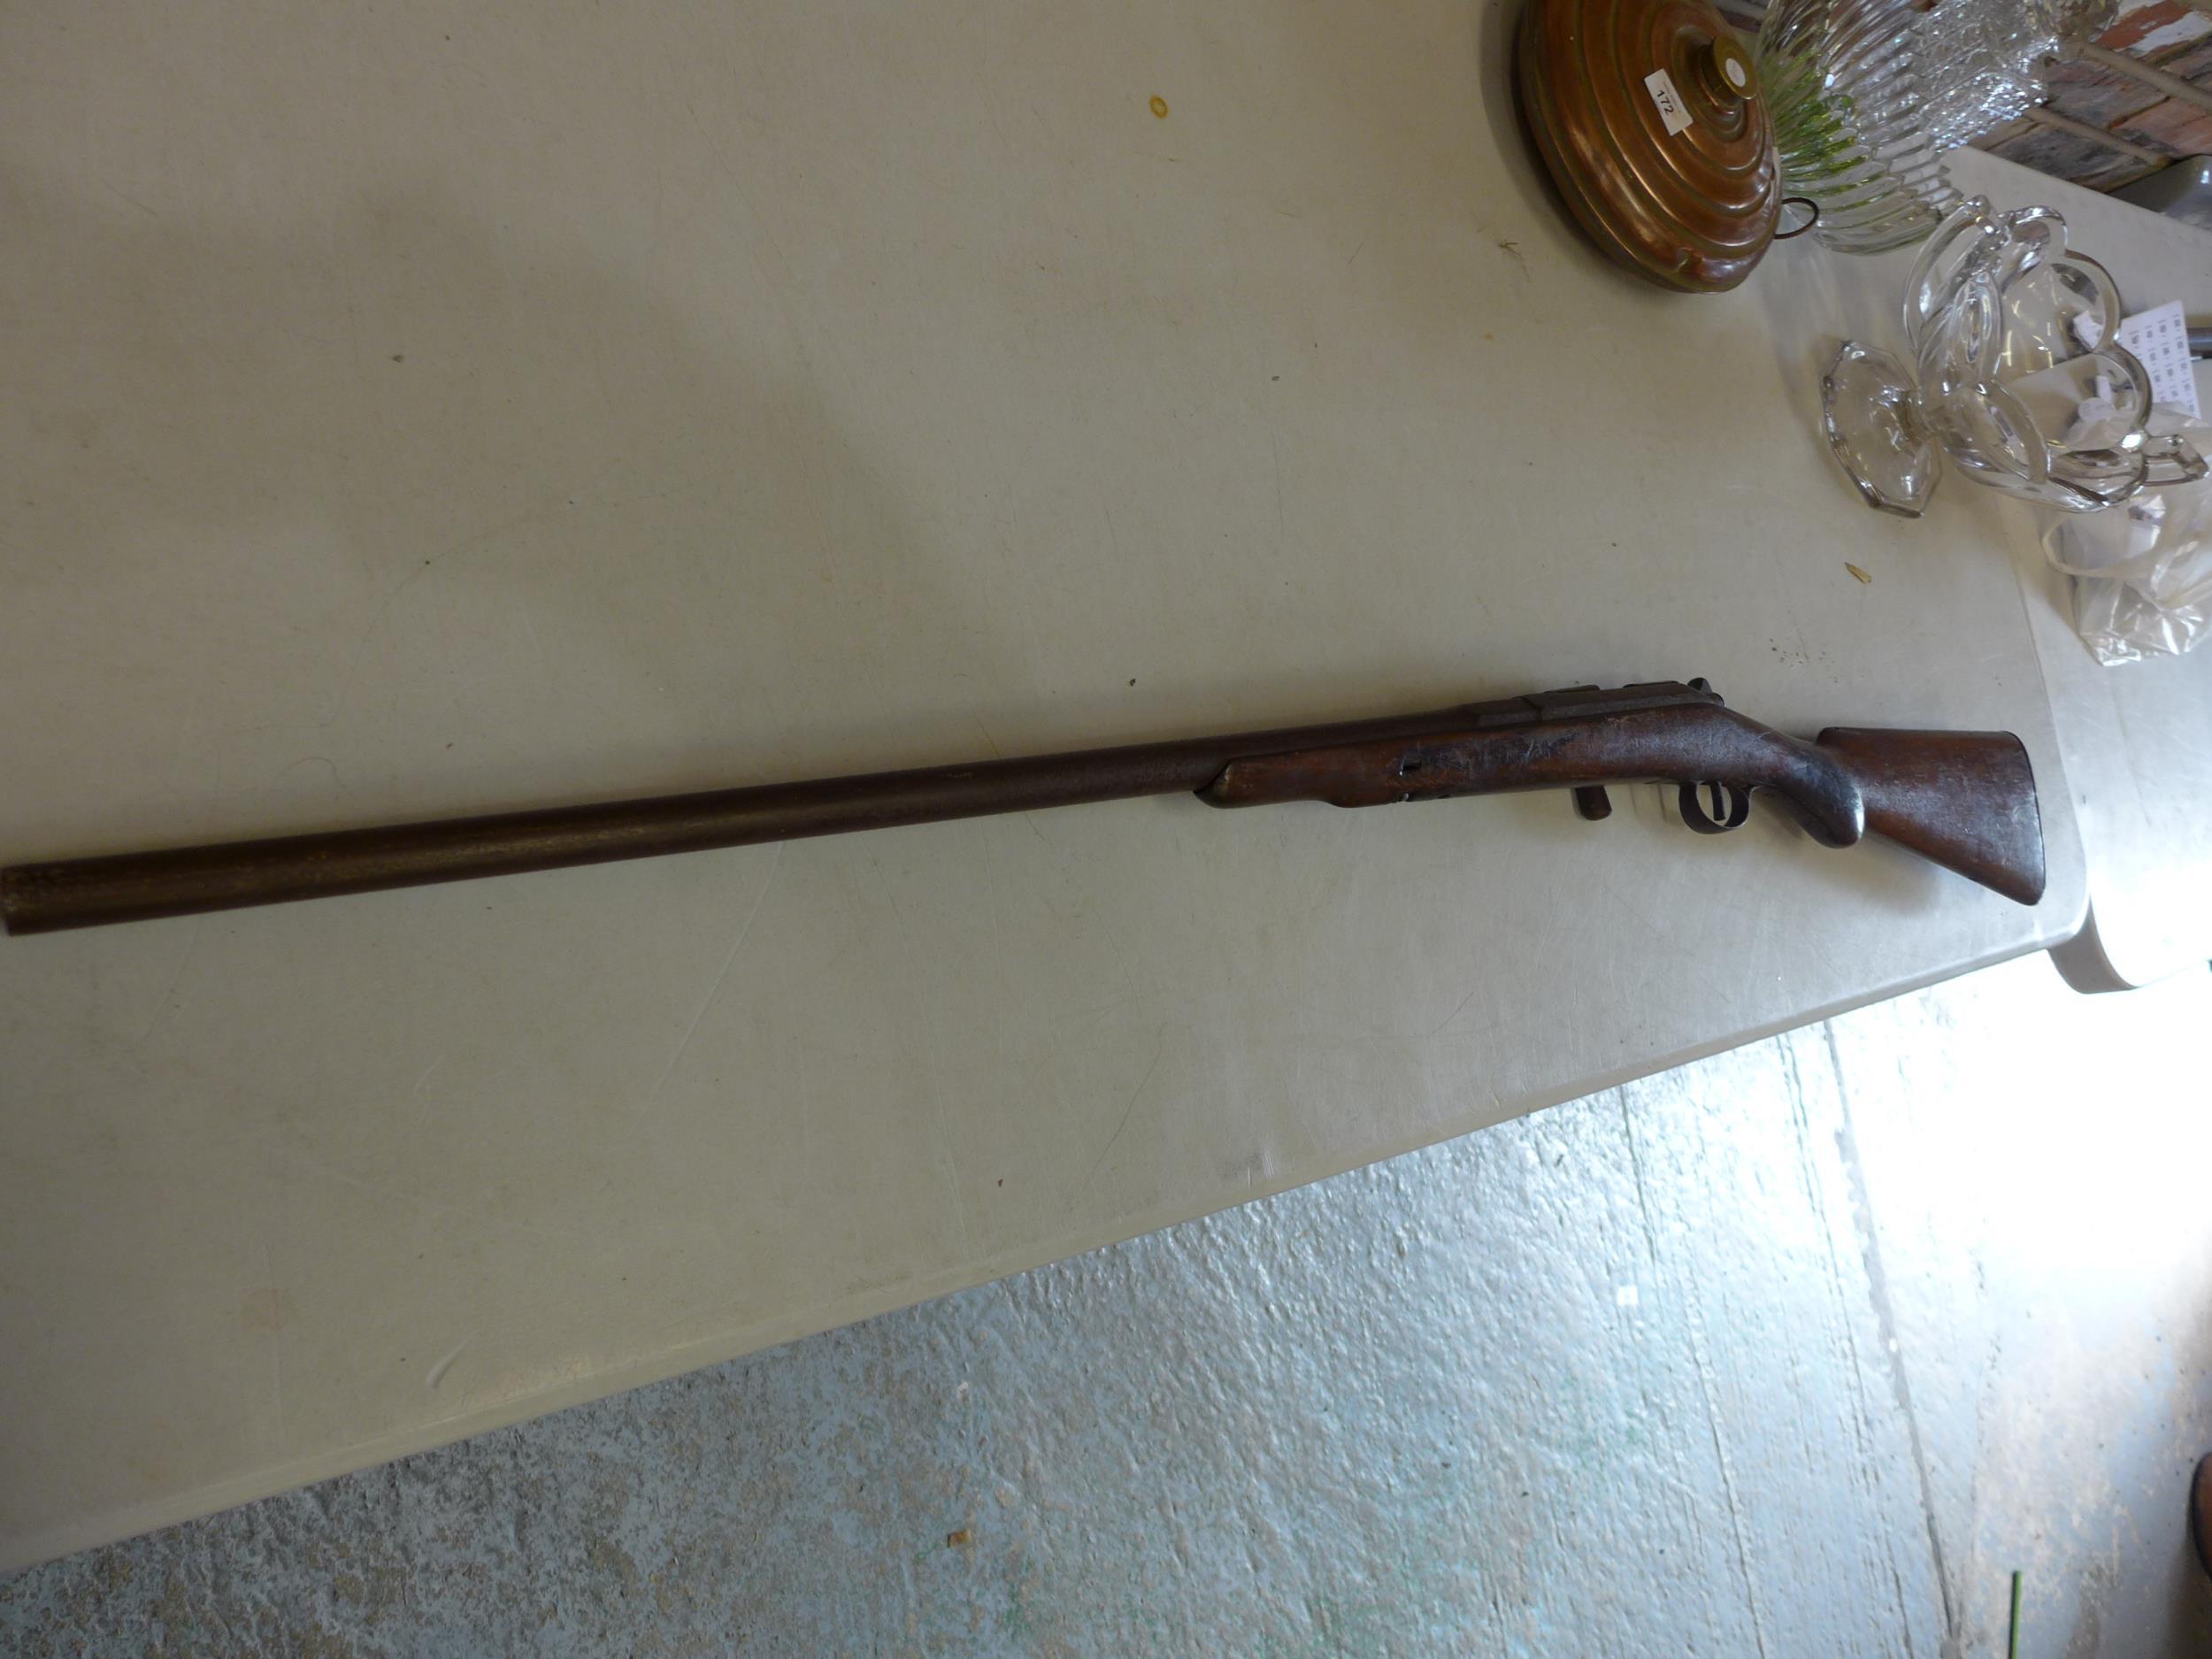 A BELGIUN MADE CHASSEPOT SMOOTH BORE BOLT ACTION SINGLE BARREL GUN, 71CM BARREL - Image 3 of 4